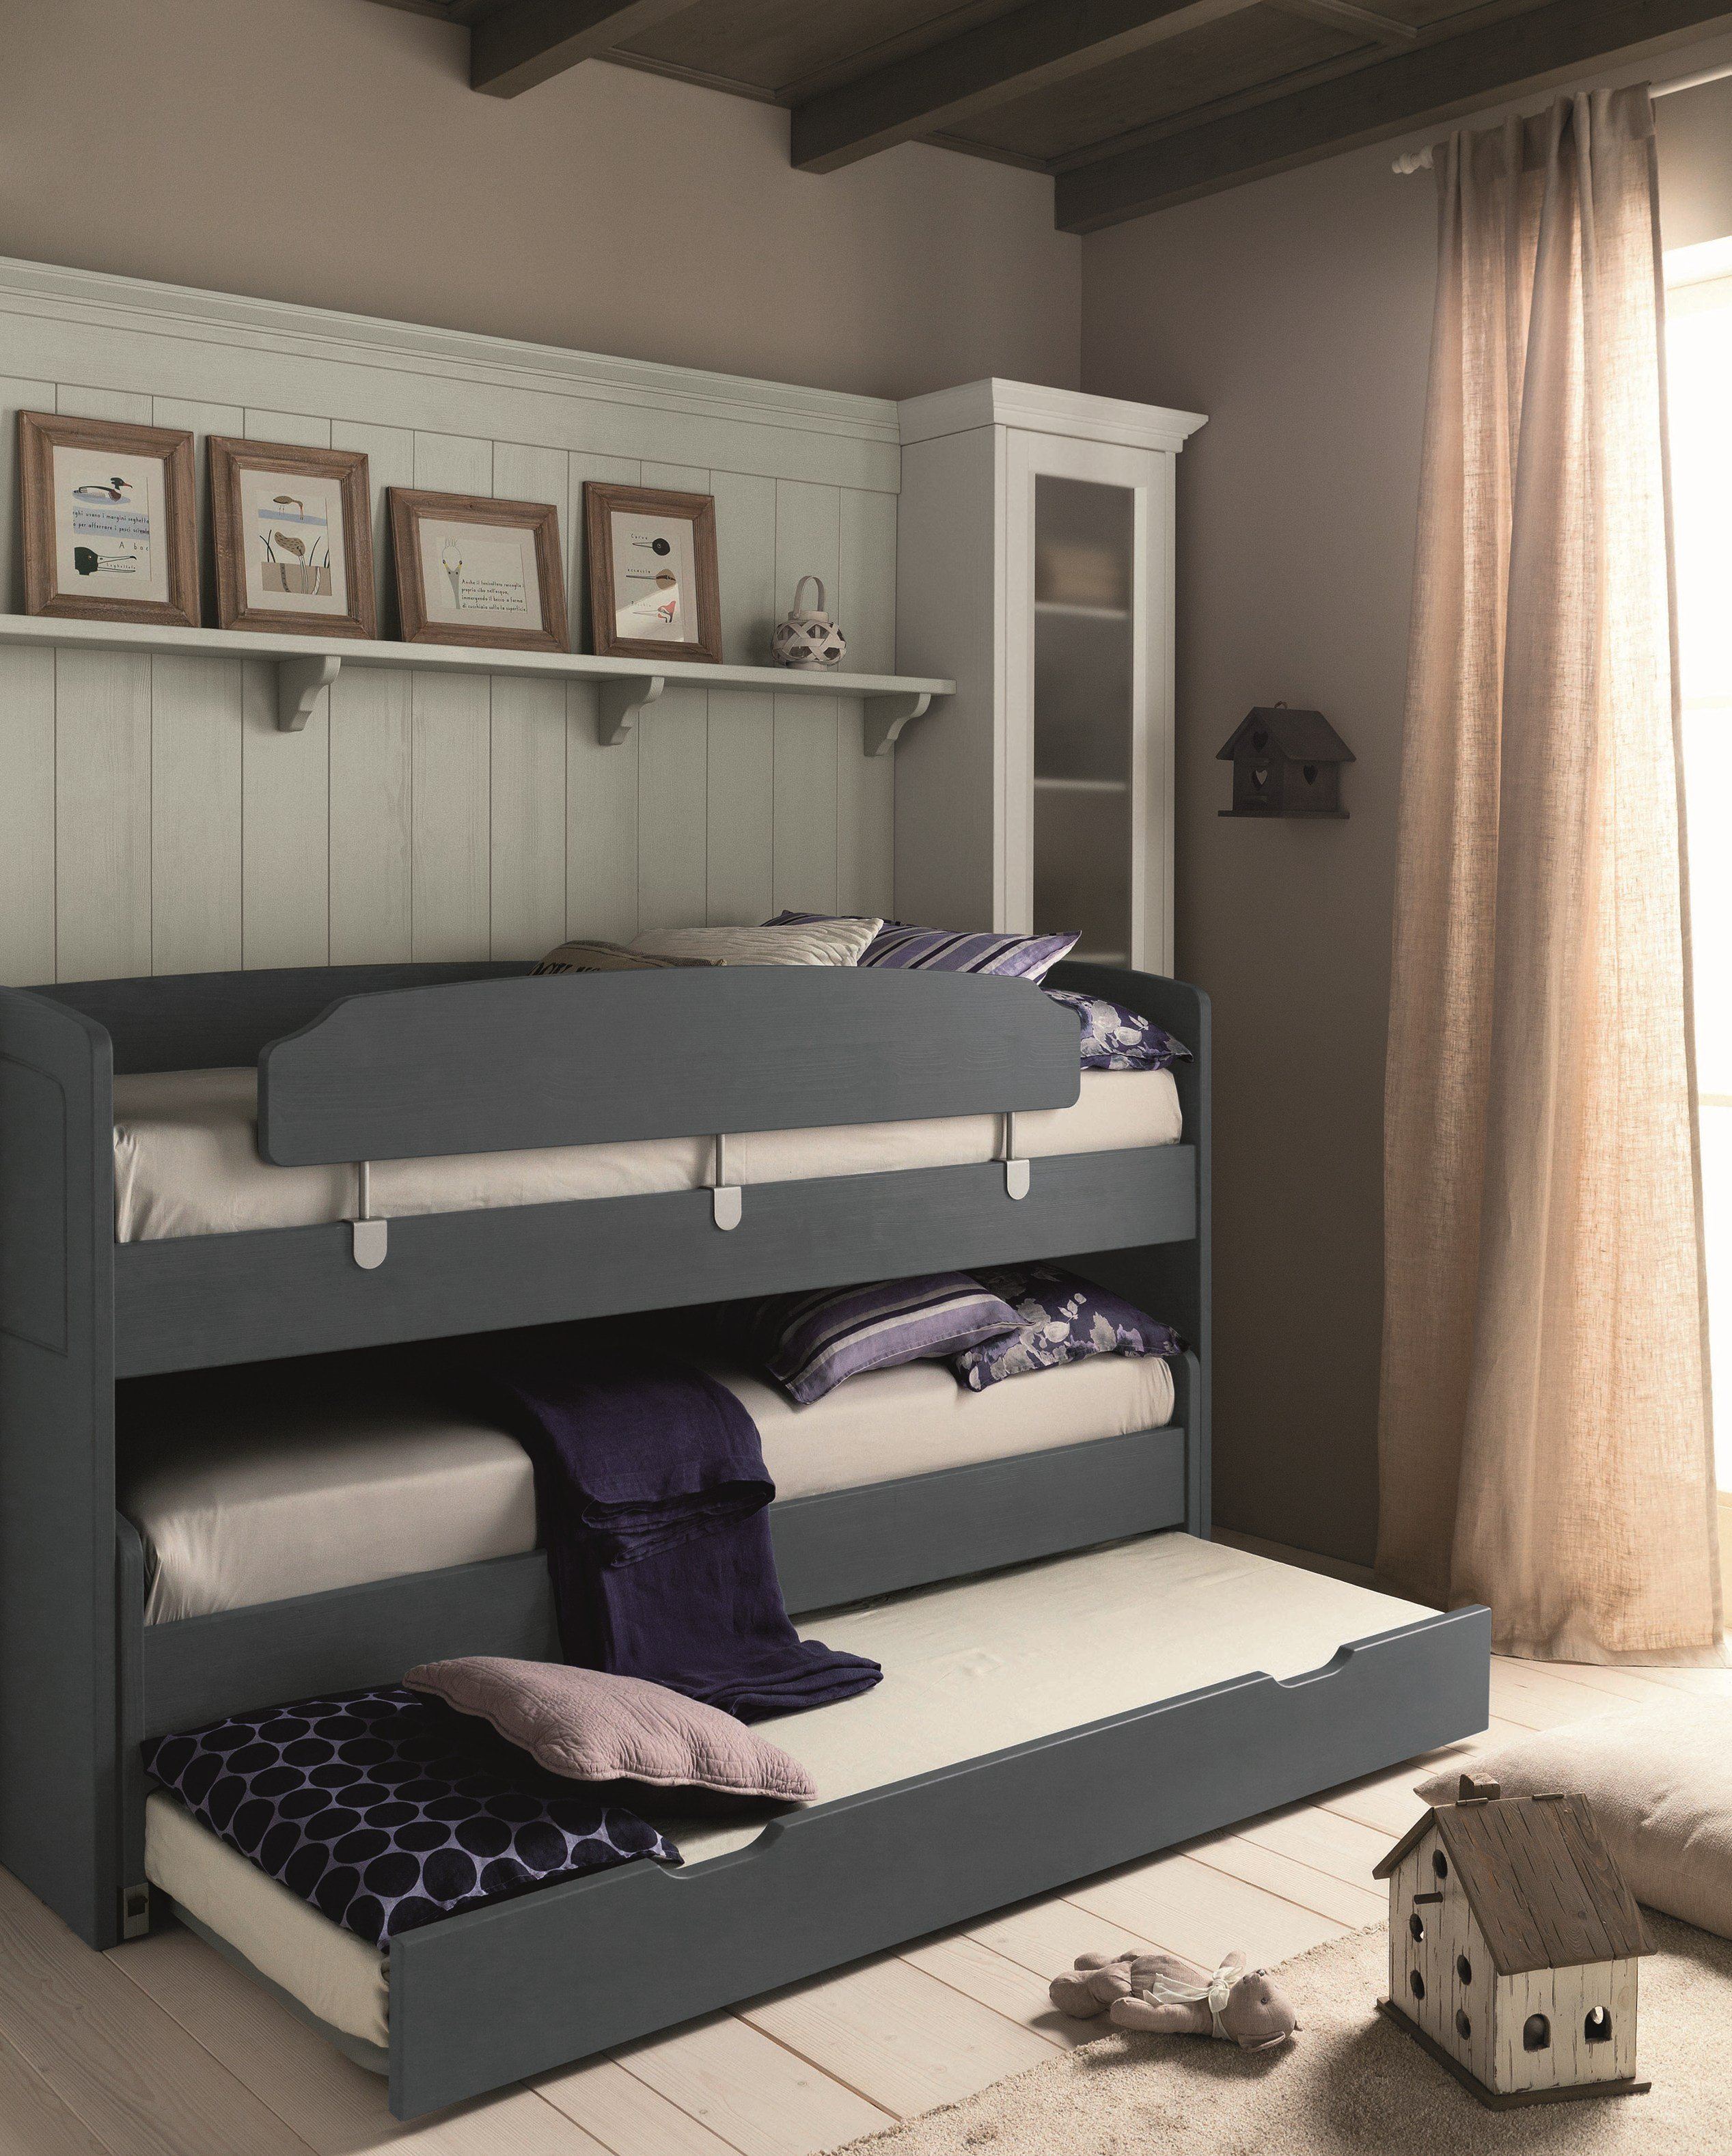 Stunning Letto A Scomparsa Usato Ideas - Amazing House Design ...